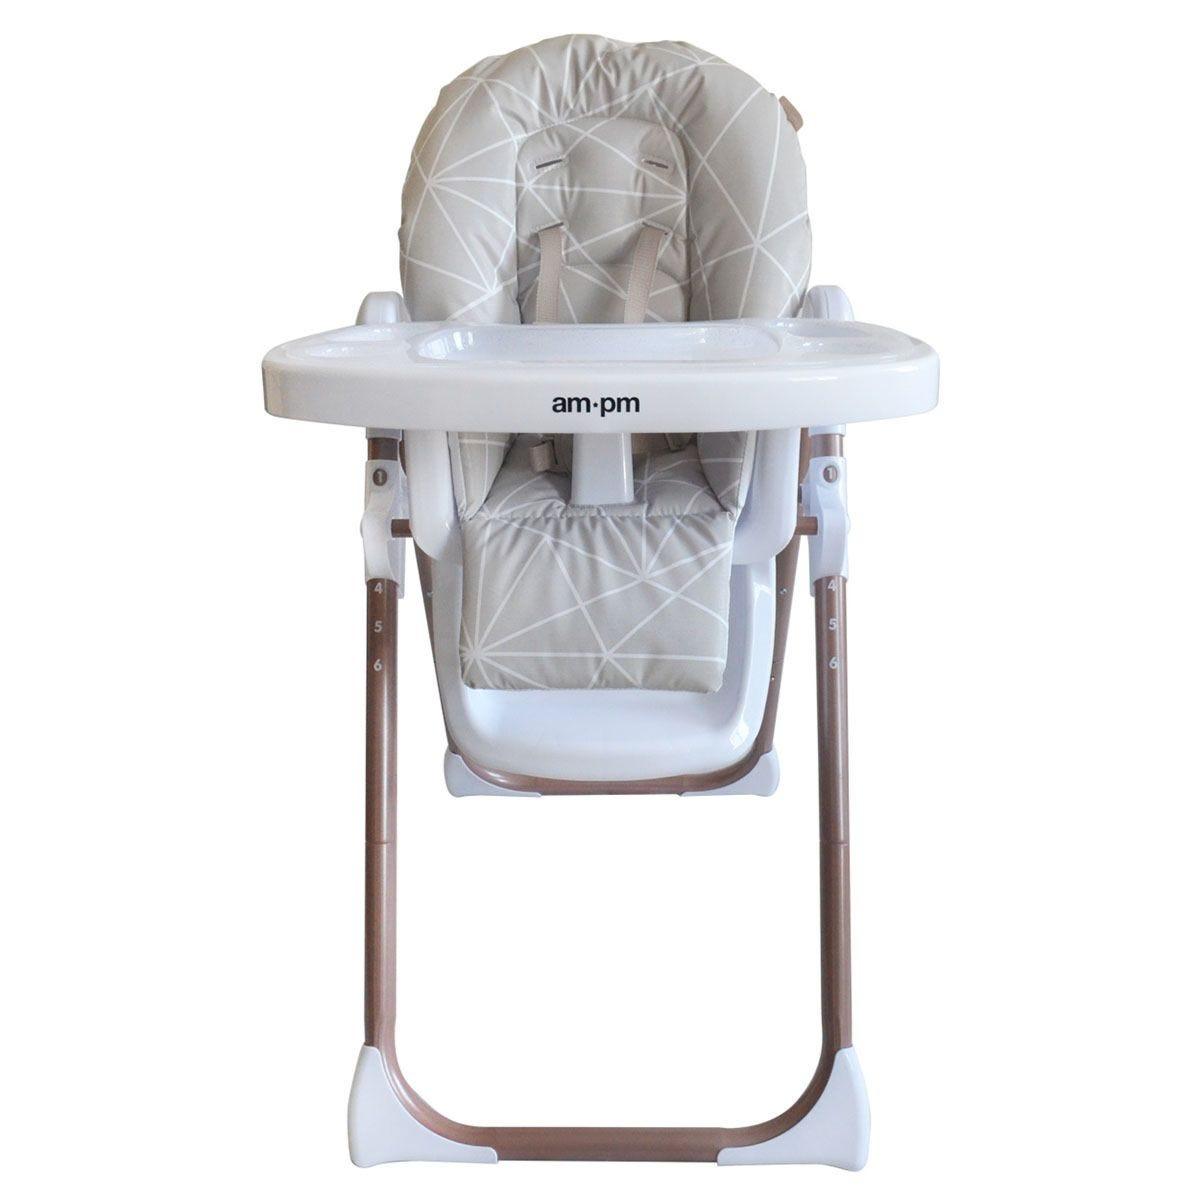 My Babiie Christina Milian AMPM Premium Highchair - Geometric Mocha